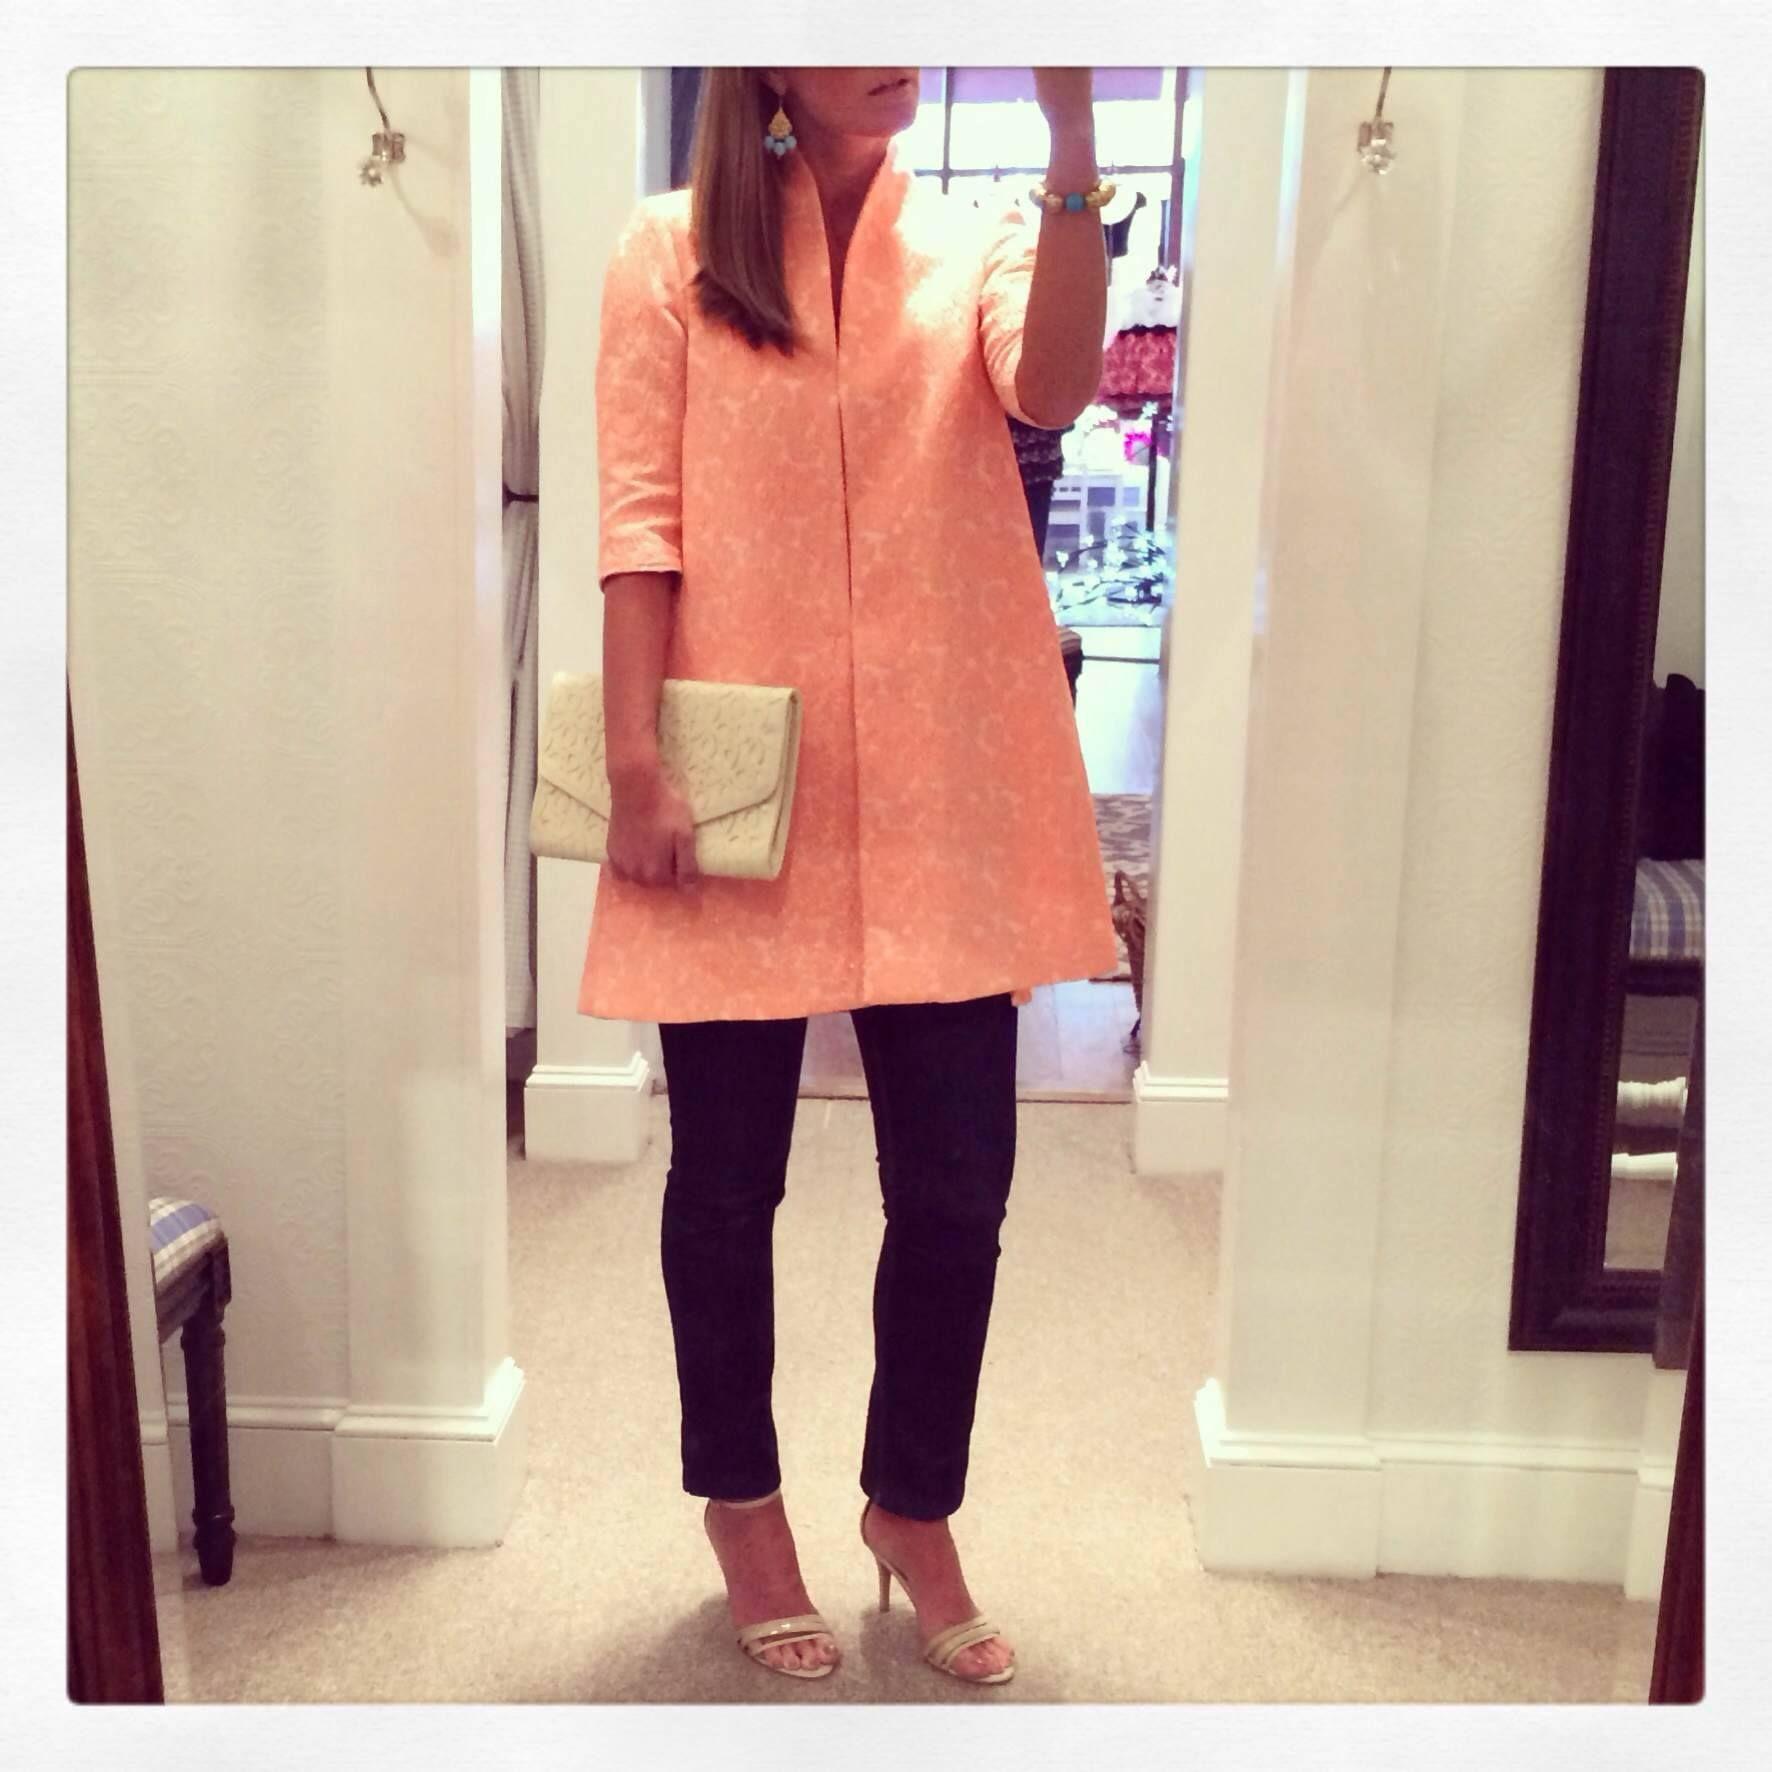 Date Night Outfit by @Yoana Baraschi !!